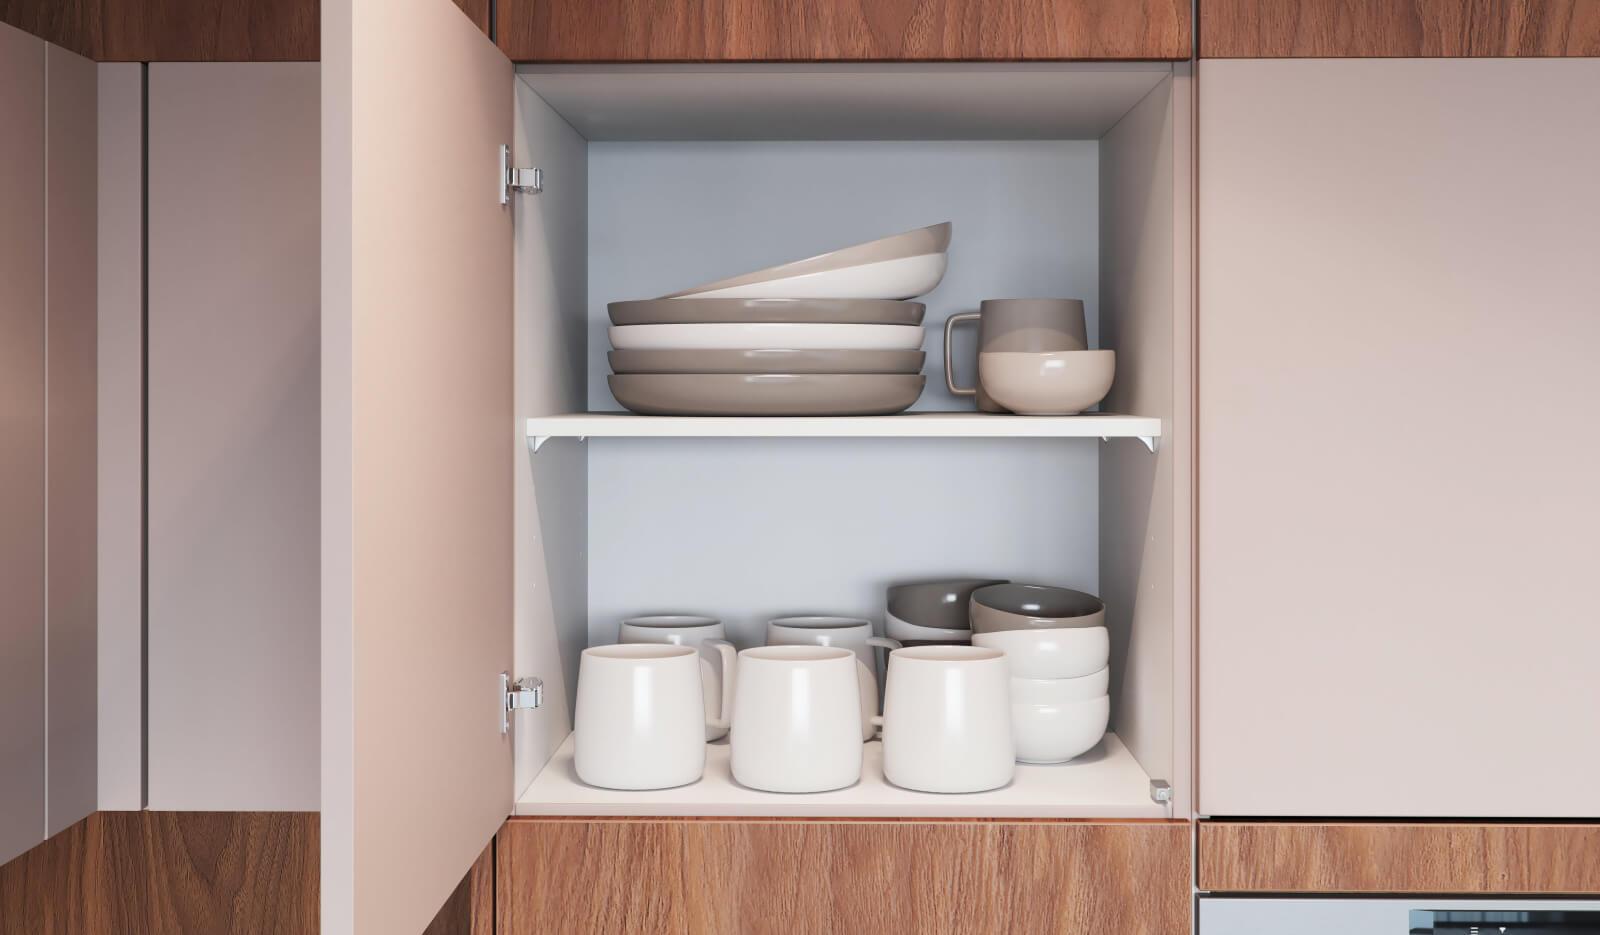 Keuken Atlas Marmergrijs - opbergruimte